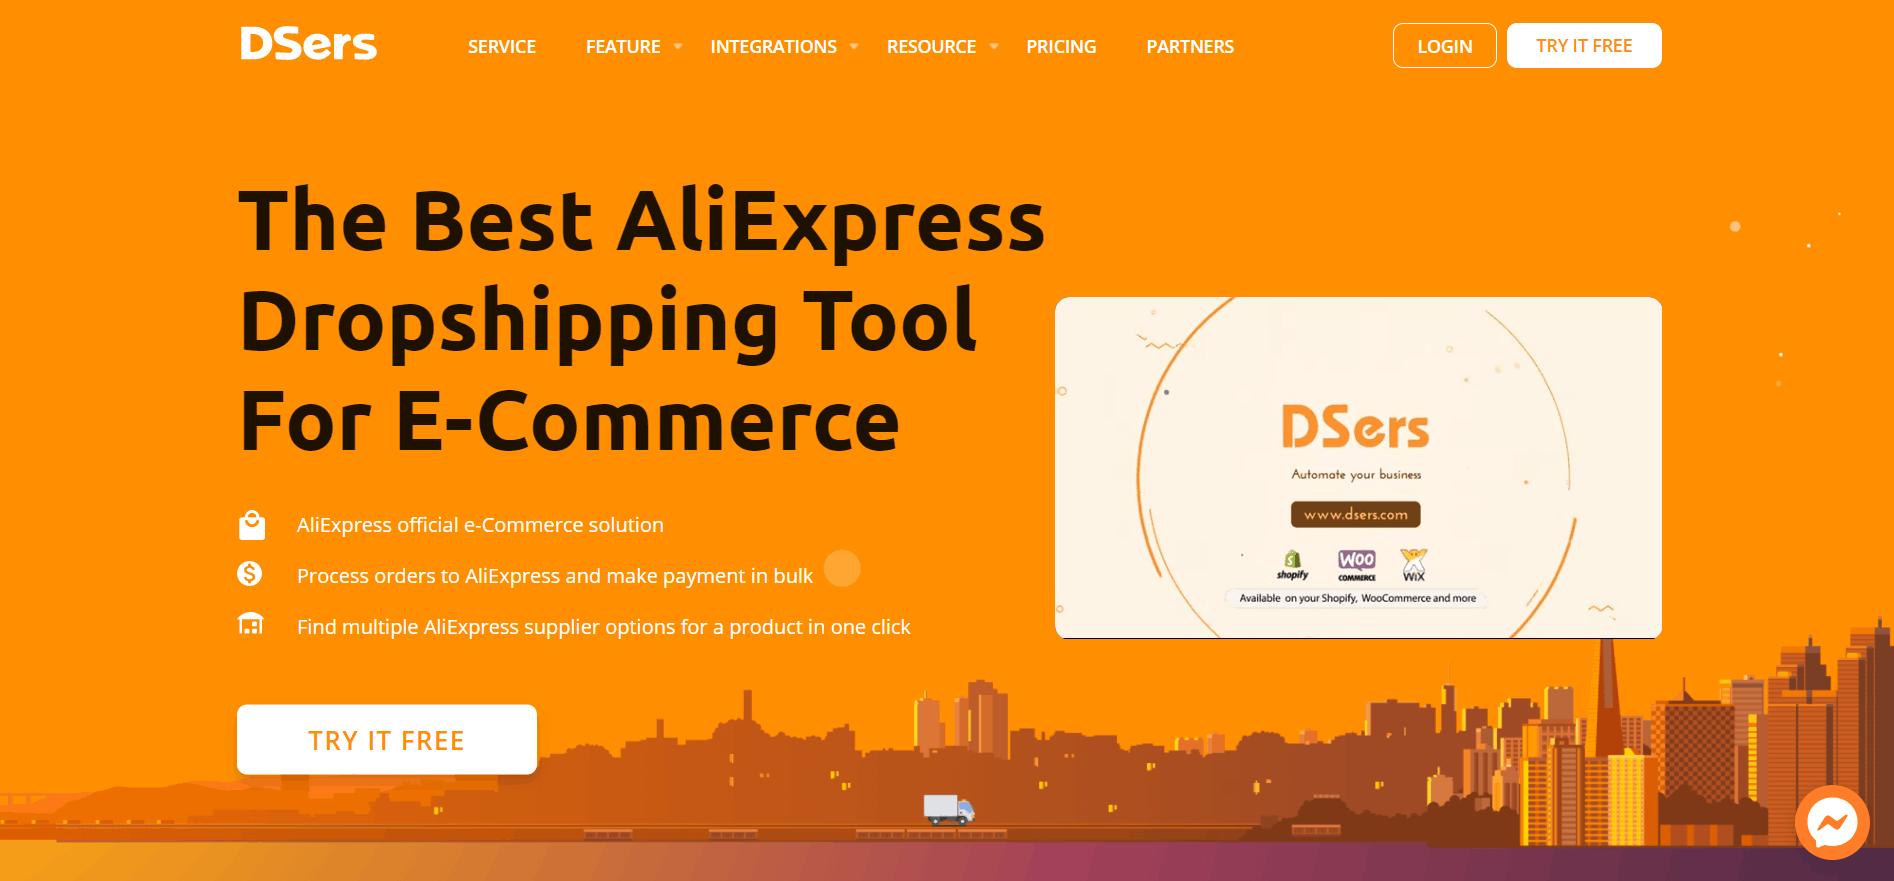 Desers homepage